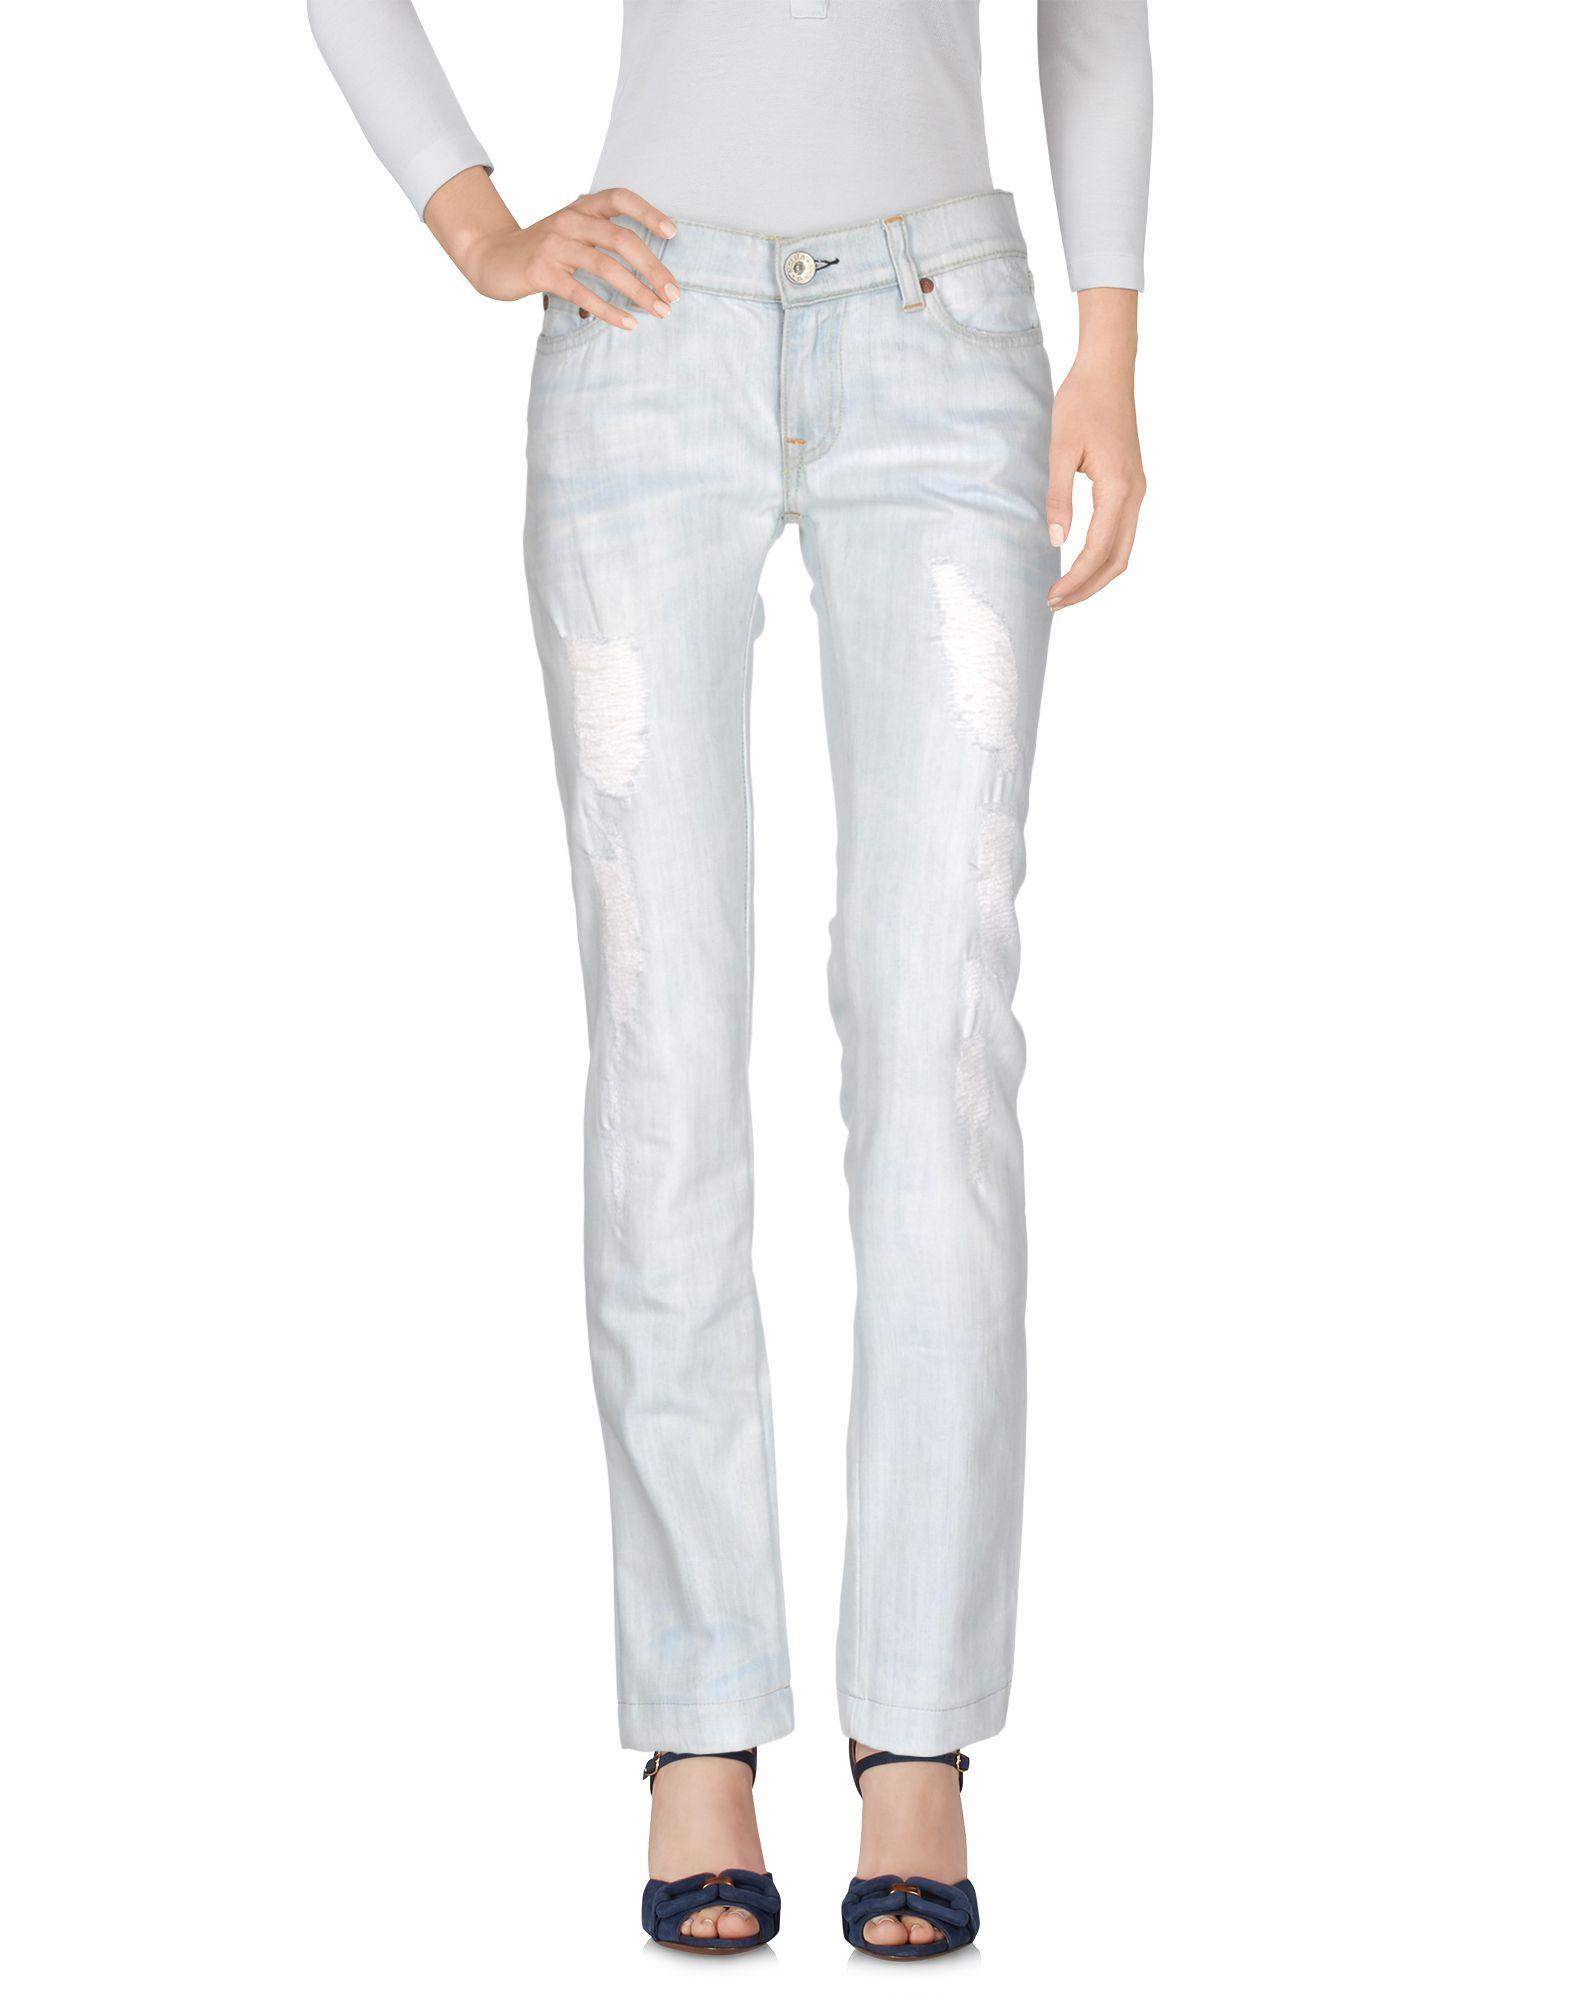 NOLITA DE NIMES Damen Jeanshose Farbe Blau Größe 4 - broschei